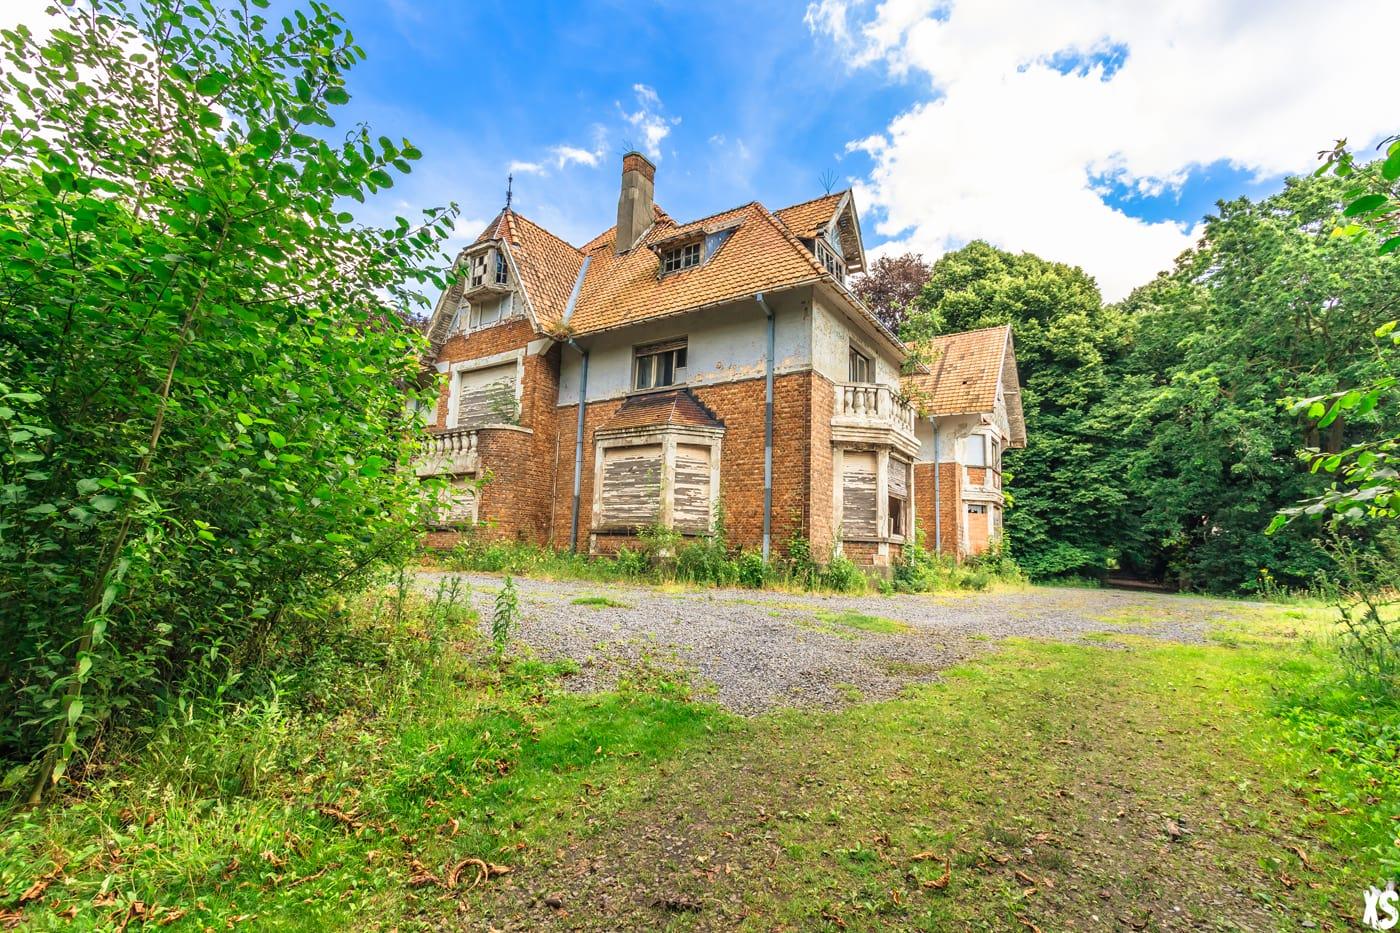 Villa abandonnée en Belgique - Urbex